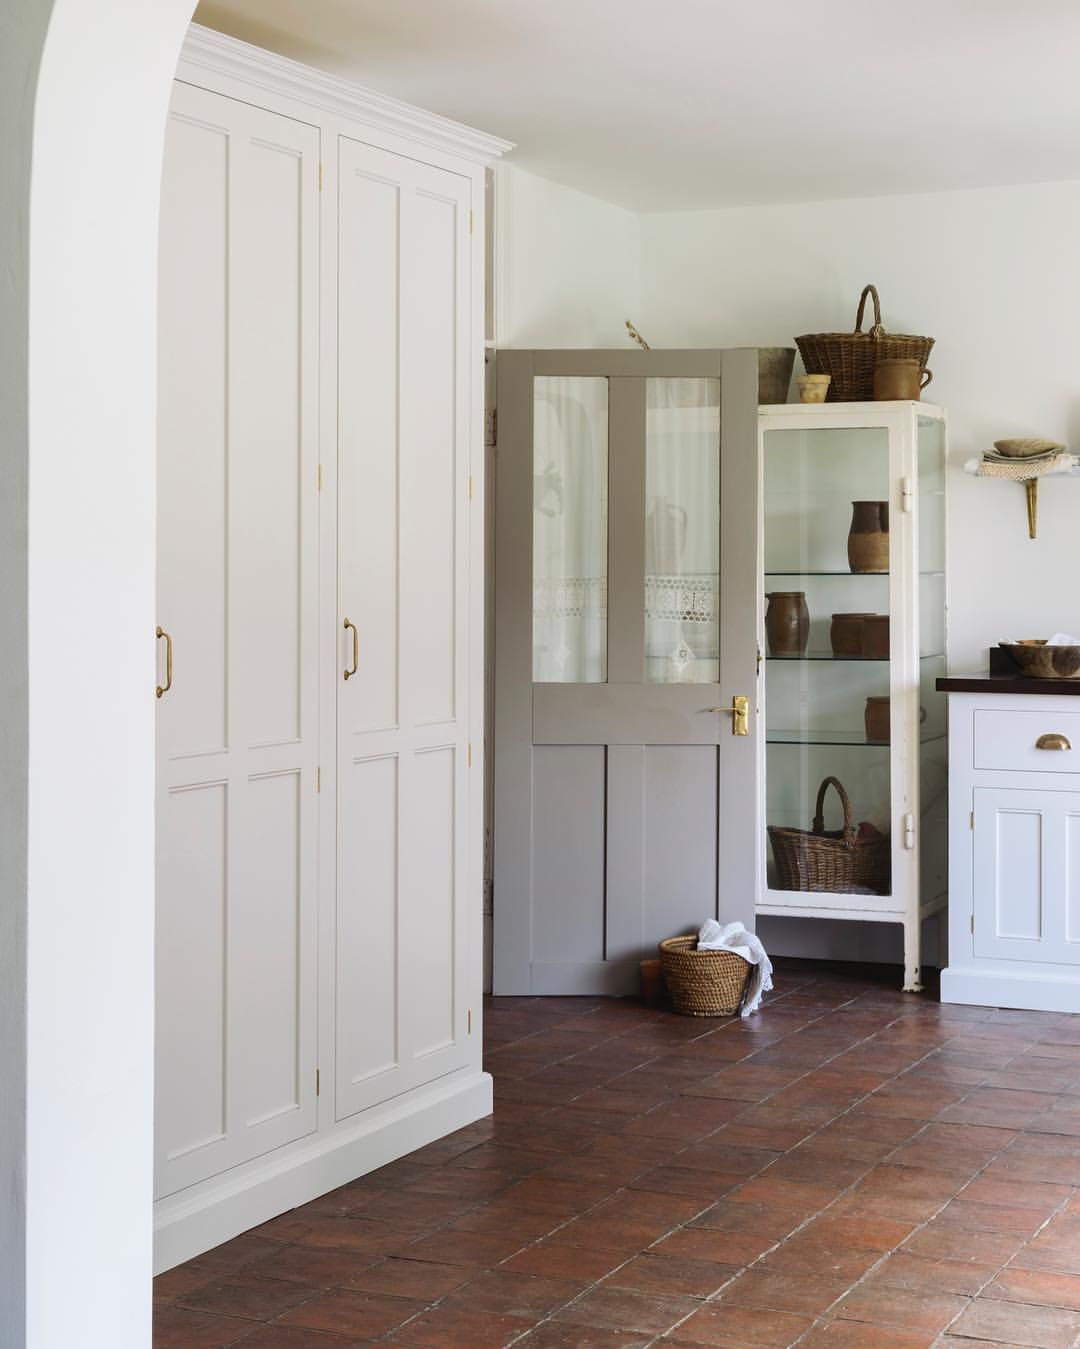 devol kitchens on instagram u201ca terracotta floor a classic english rh pinterest com